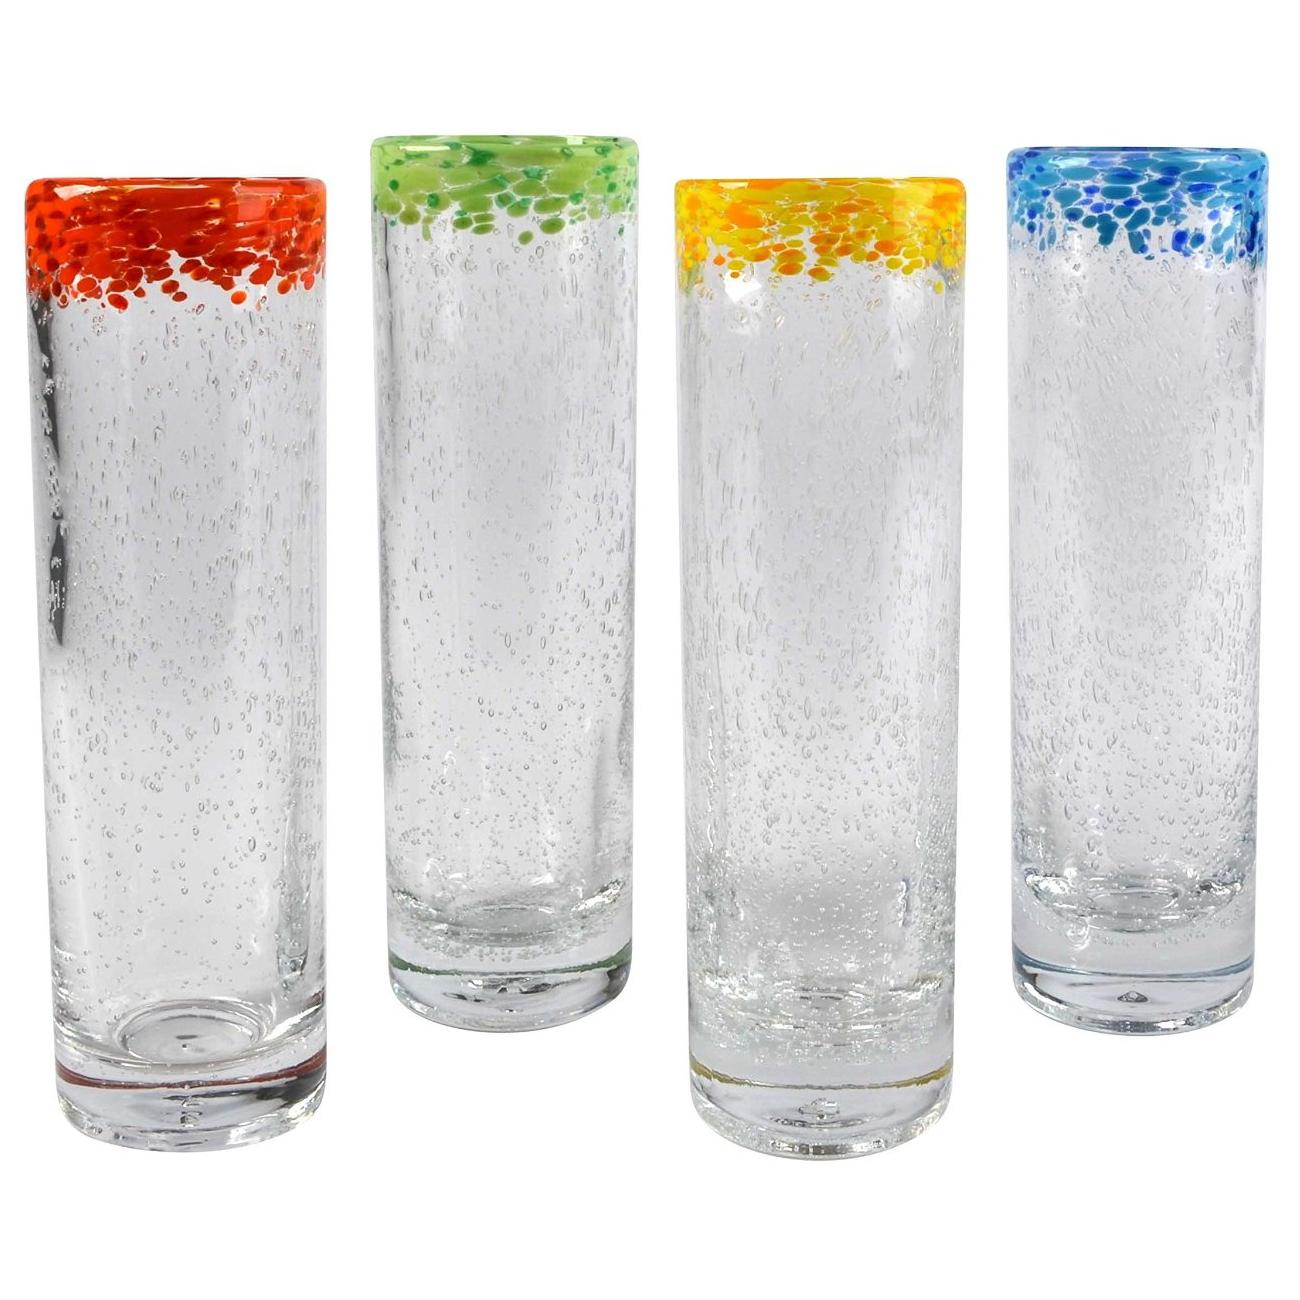 Artland Mingle 12 Ounce Cooler Glass with Reusable Straw, Set of 4